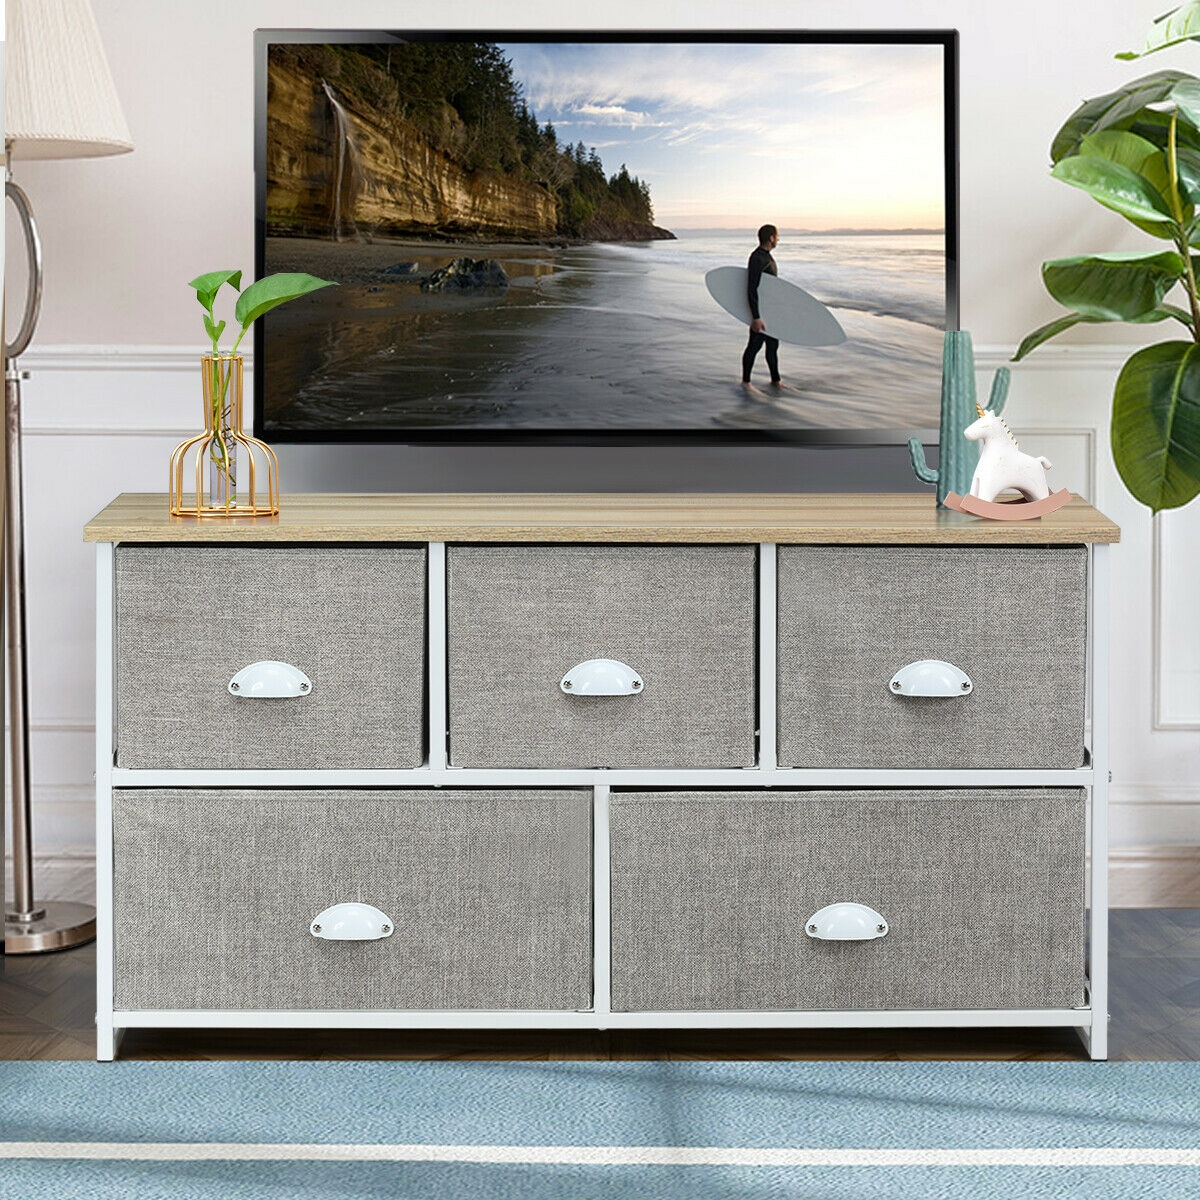 Dresser Storage Unit Side Table Display Organizer Dorm Room Wood